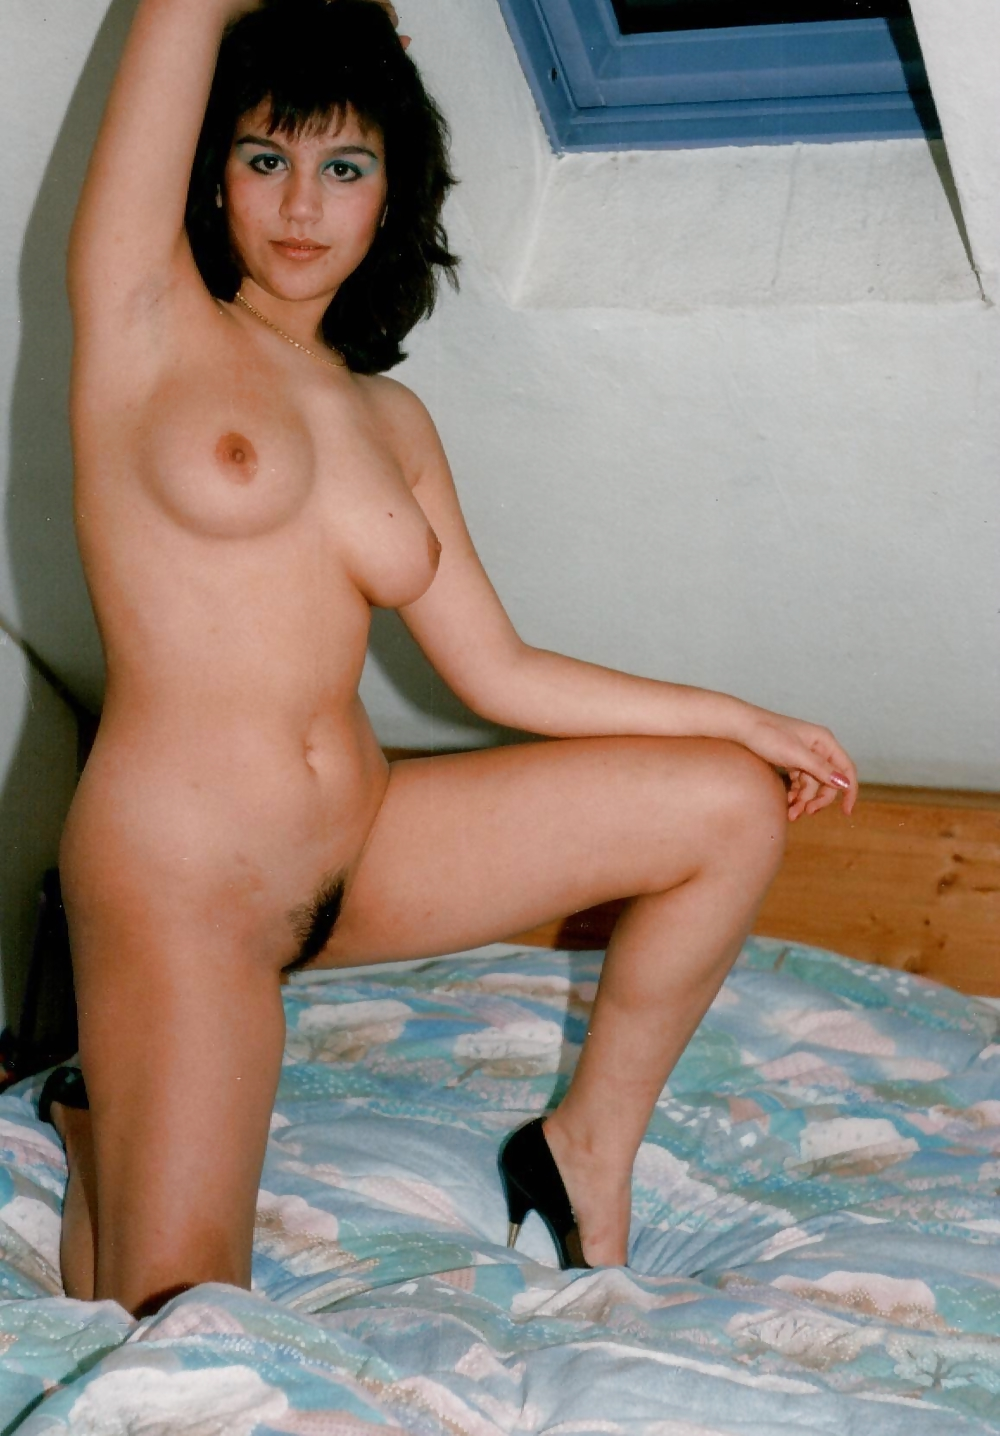 Polaroid Wives Posing Nude - 14 Pics  Xhamster-8431